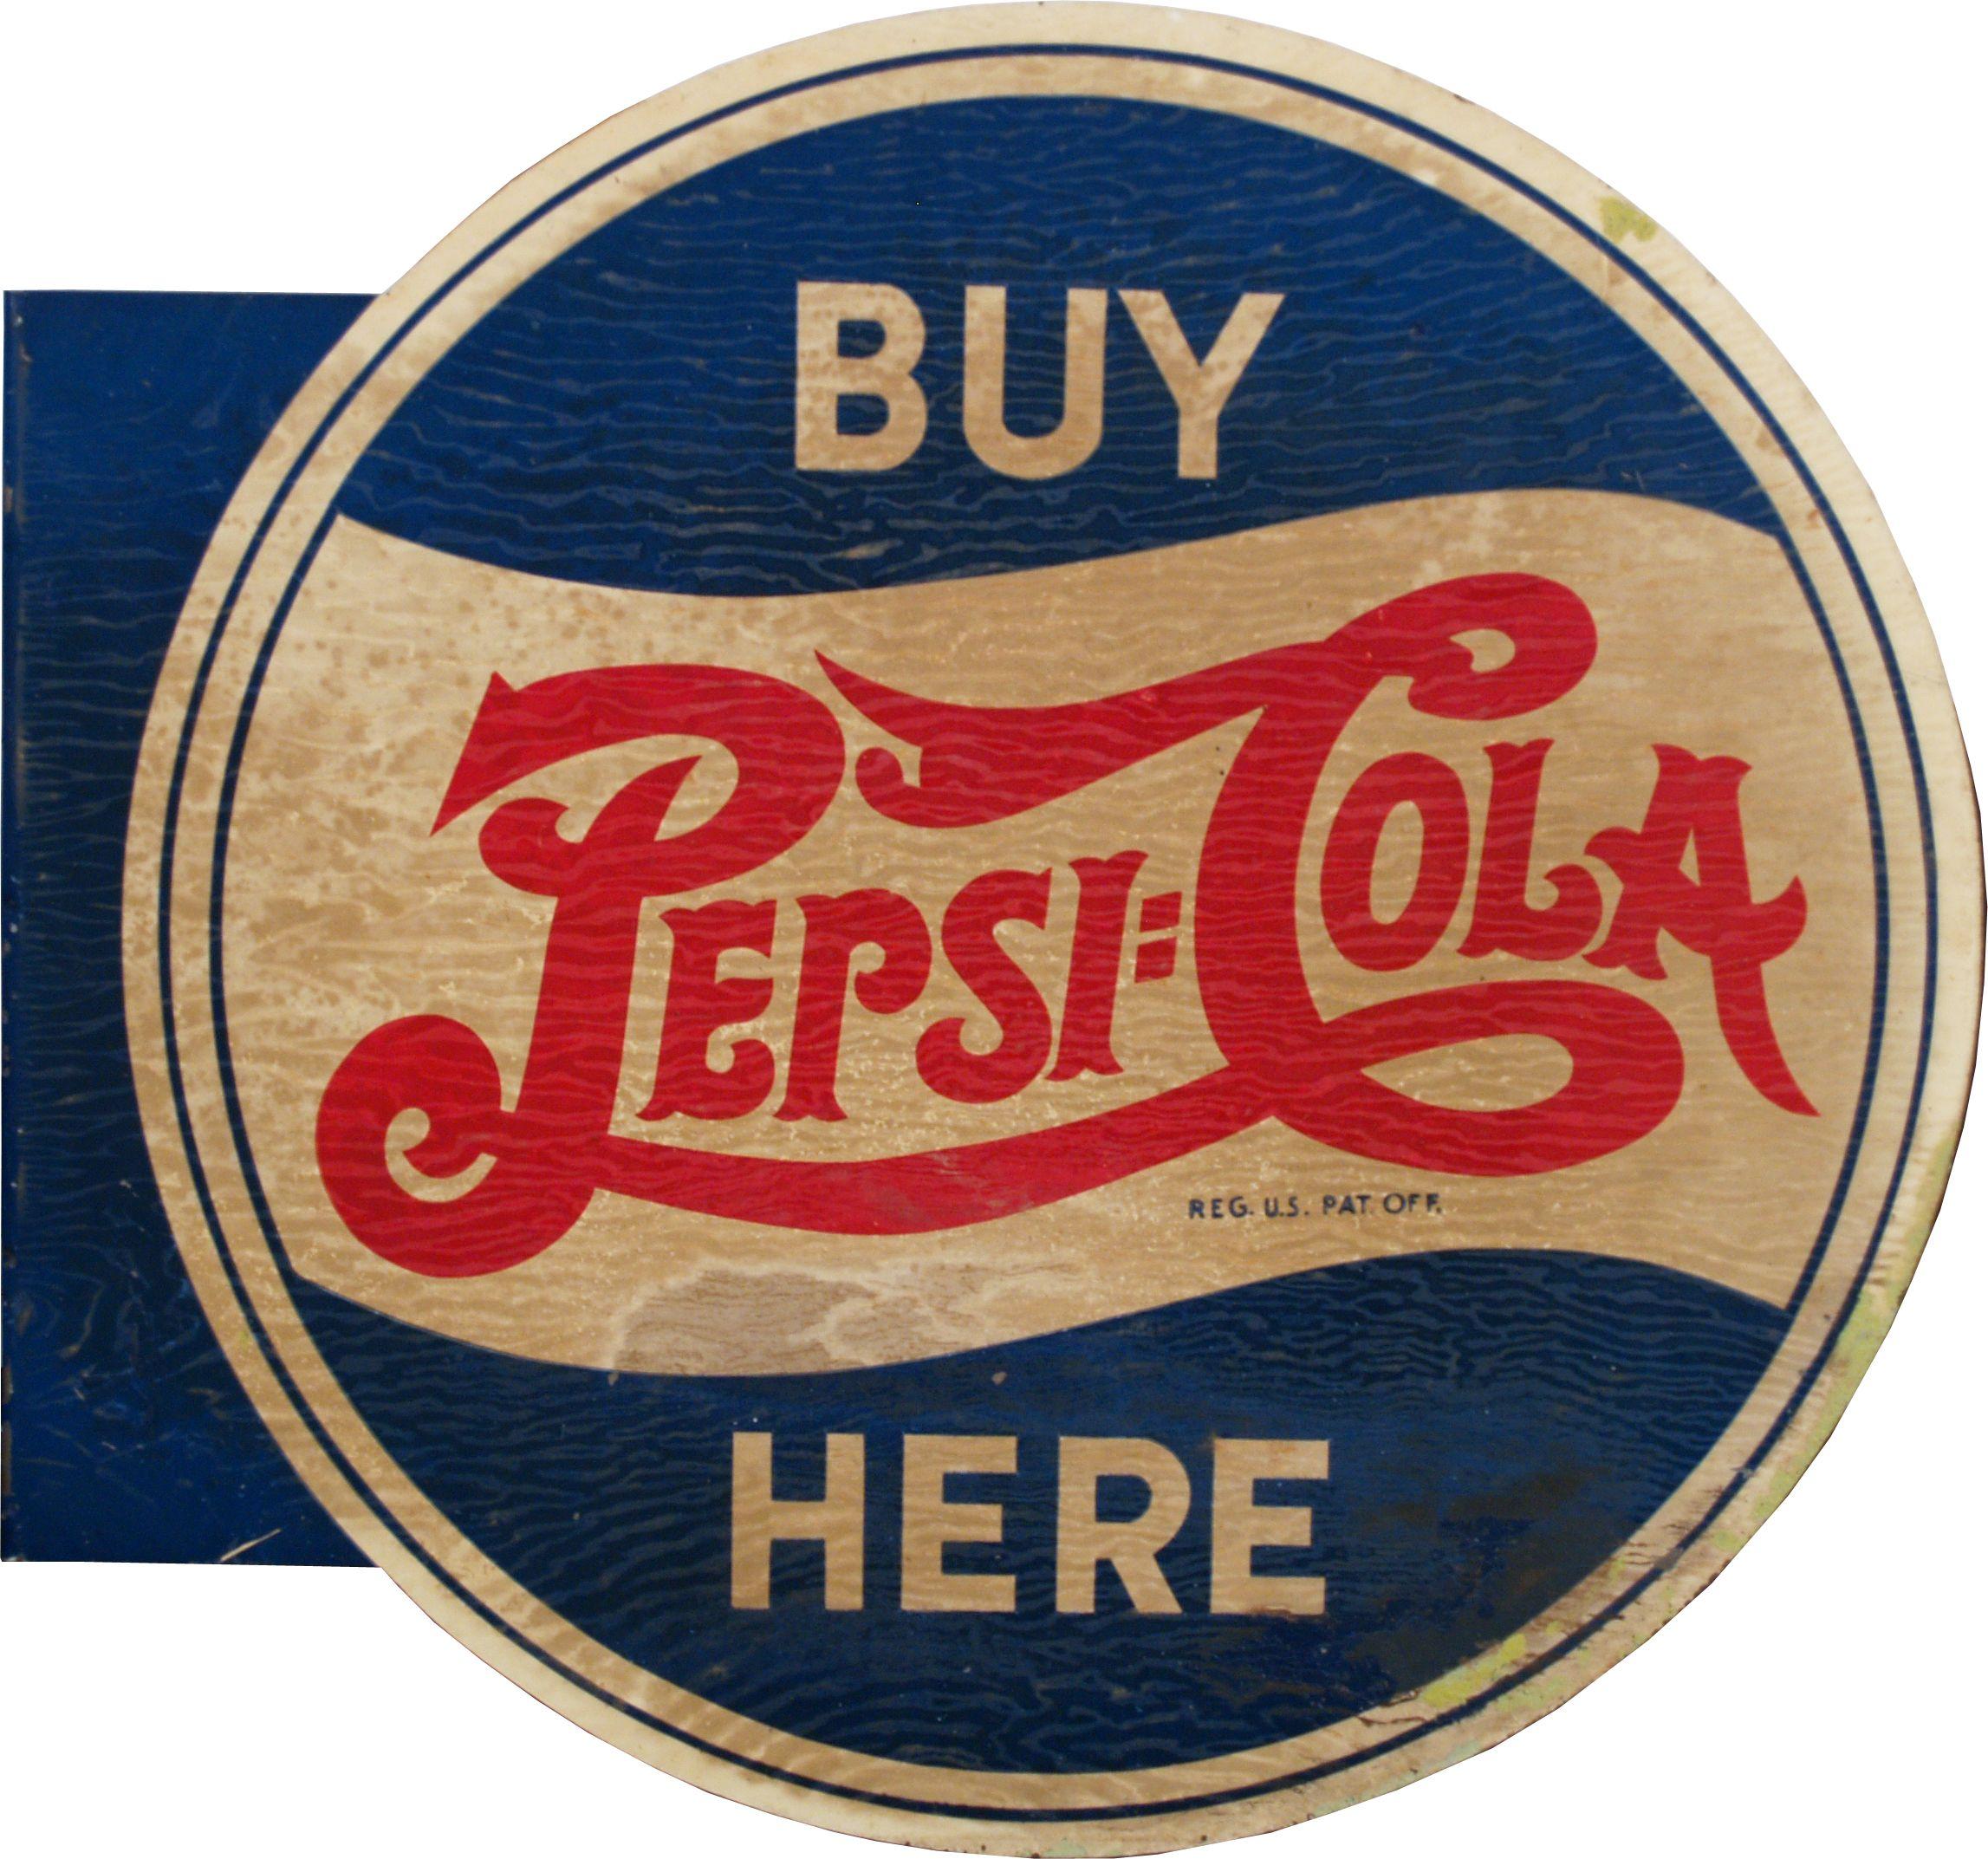 Vintage pepsi logo vca vintage buy pepsi cola here double vintage pepsi logo vca vintage buy pepsi cola here buycottarizona